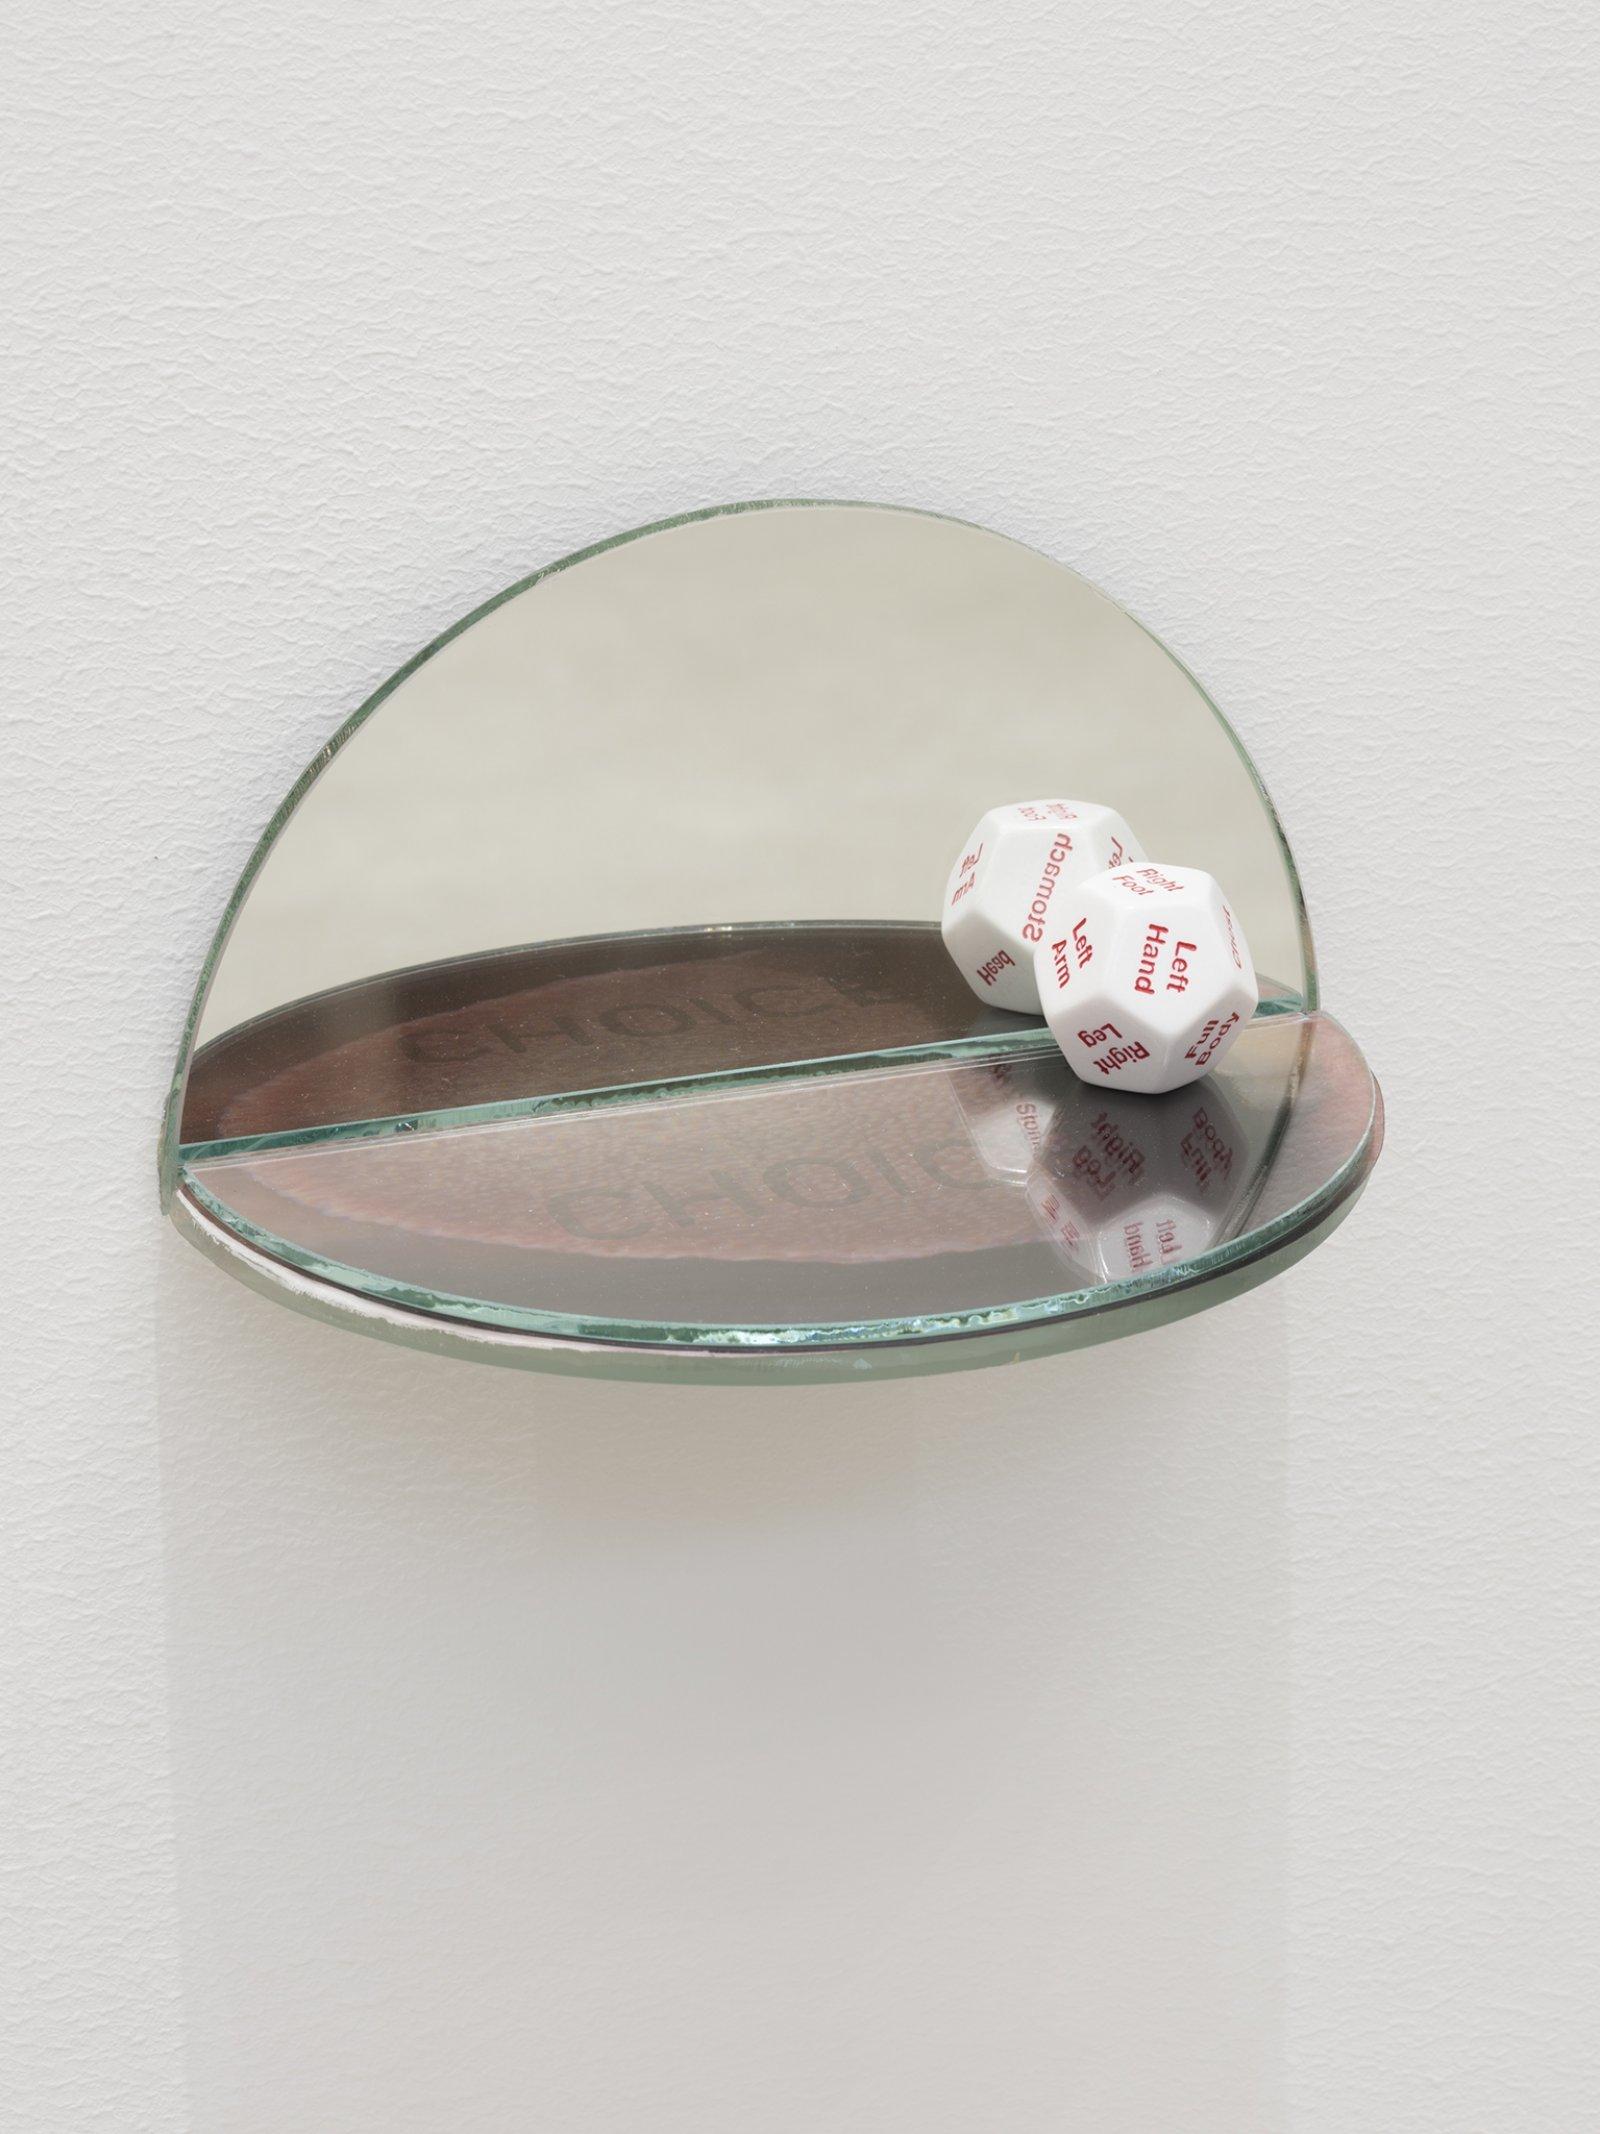 Julia Feyrer, The Ambidextrous Universe: tasting, 2018, mirror, liquid mirror, glass, fujiclear transparency, 12-sided die, 4 x 4 x 7 in. (9 x 9 x 18 cm)